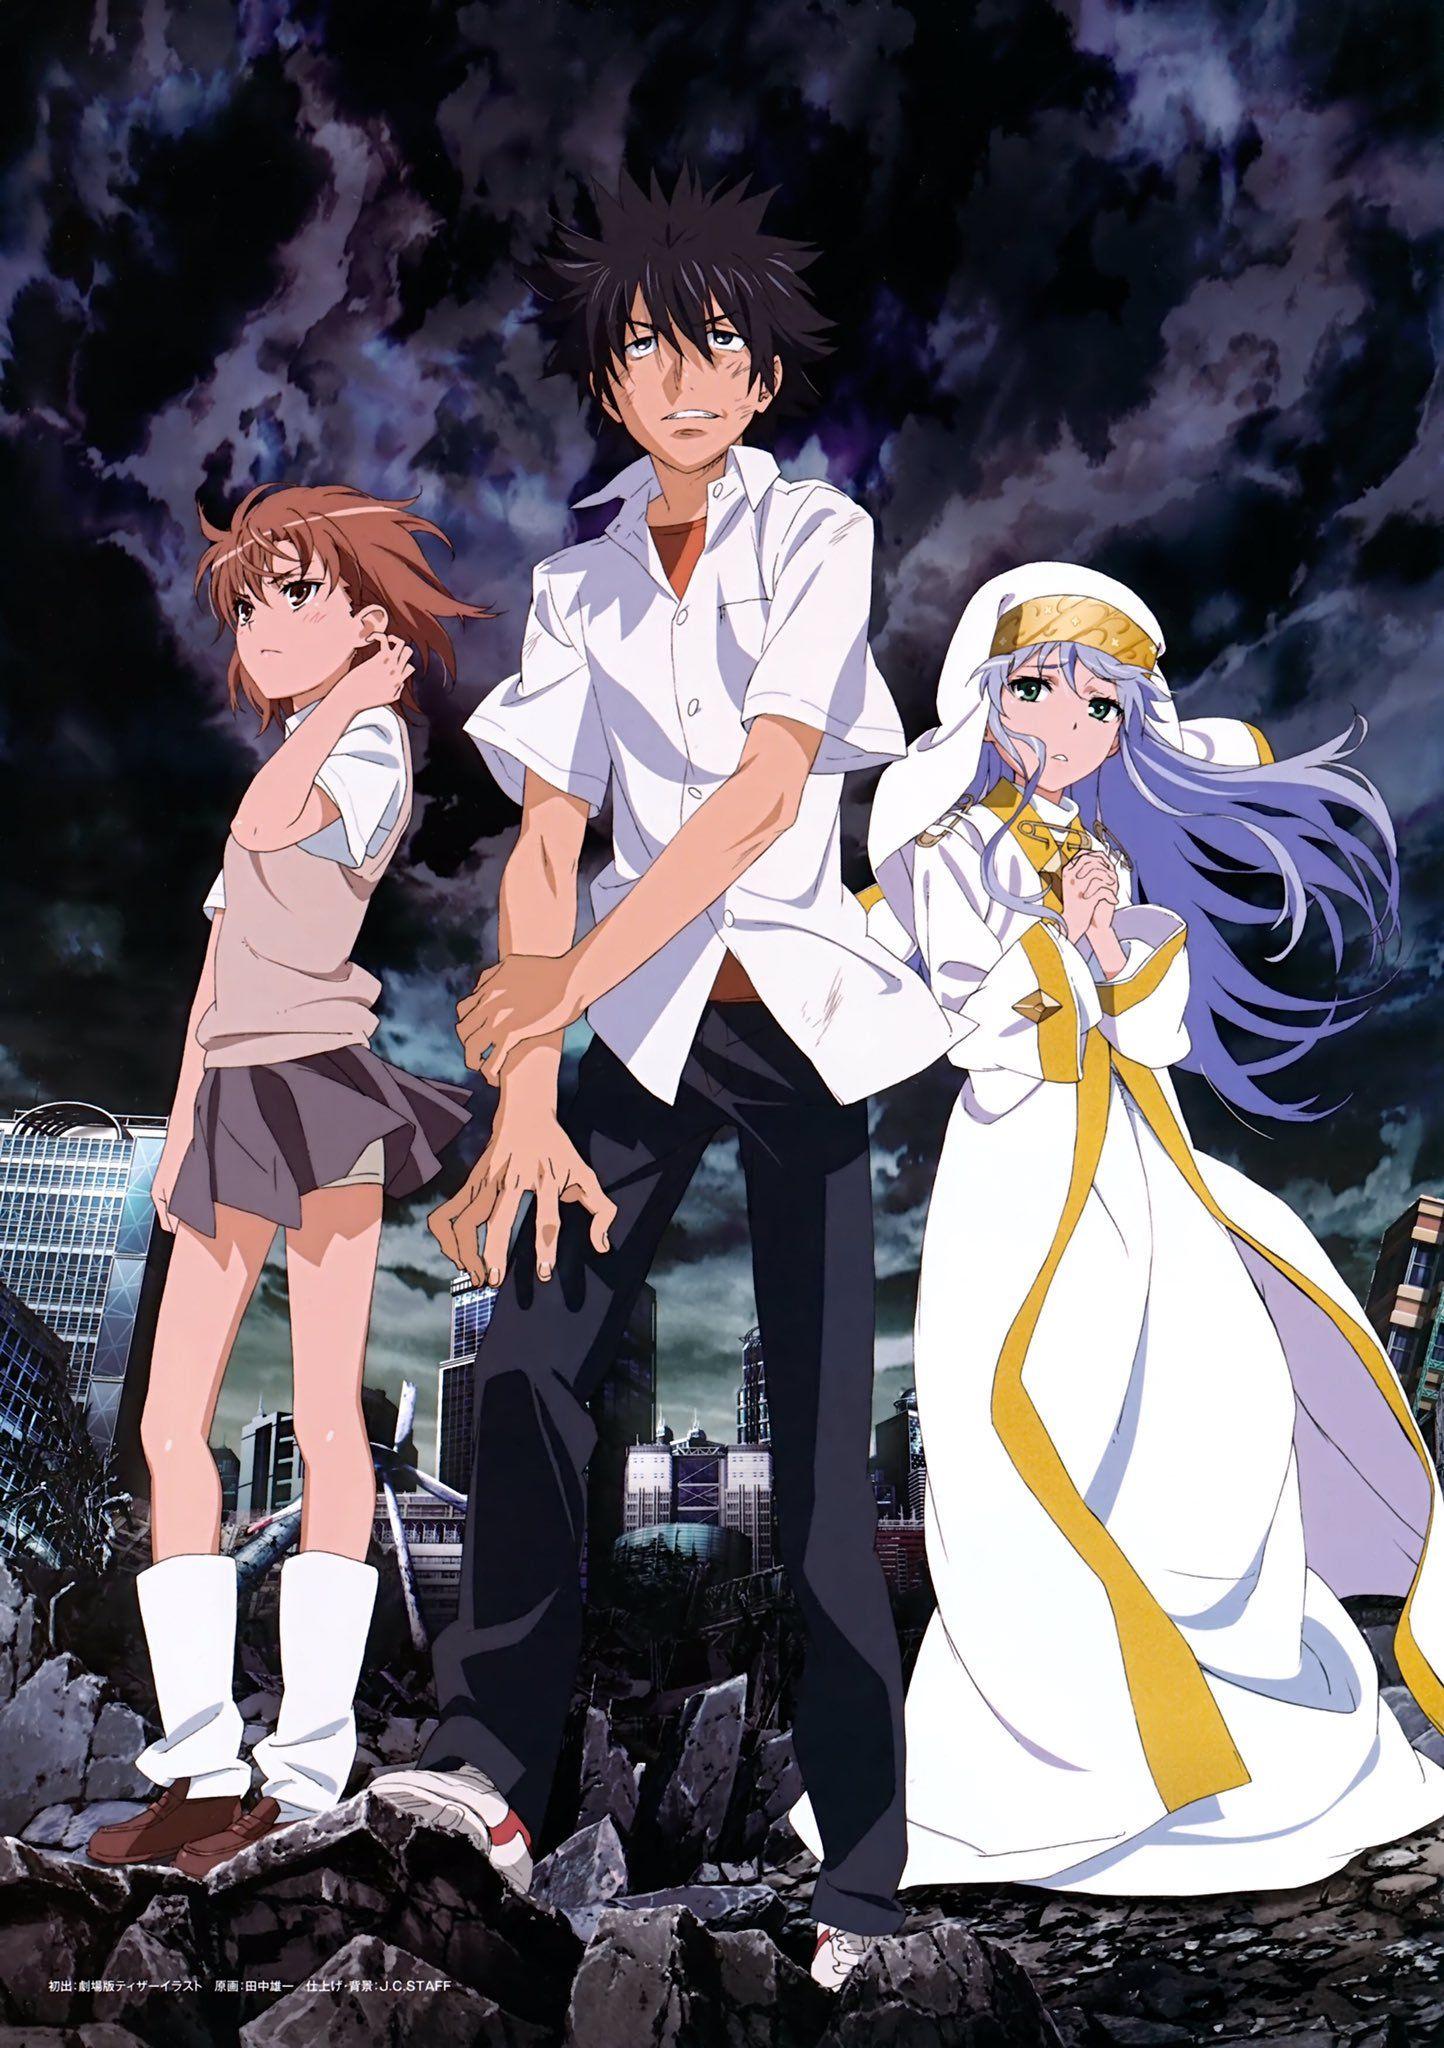 A Certain Magical Index Season 3 To Air October 2018 Anime Funny Anime Pics A Certain Magical Index